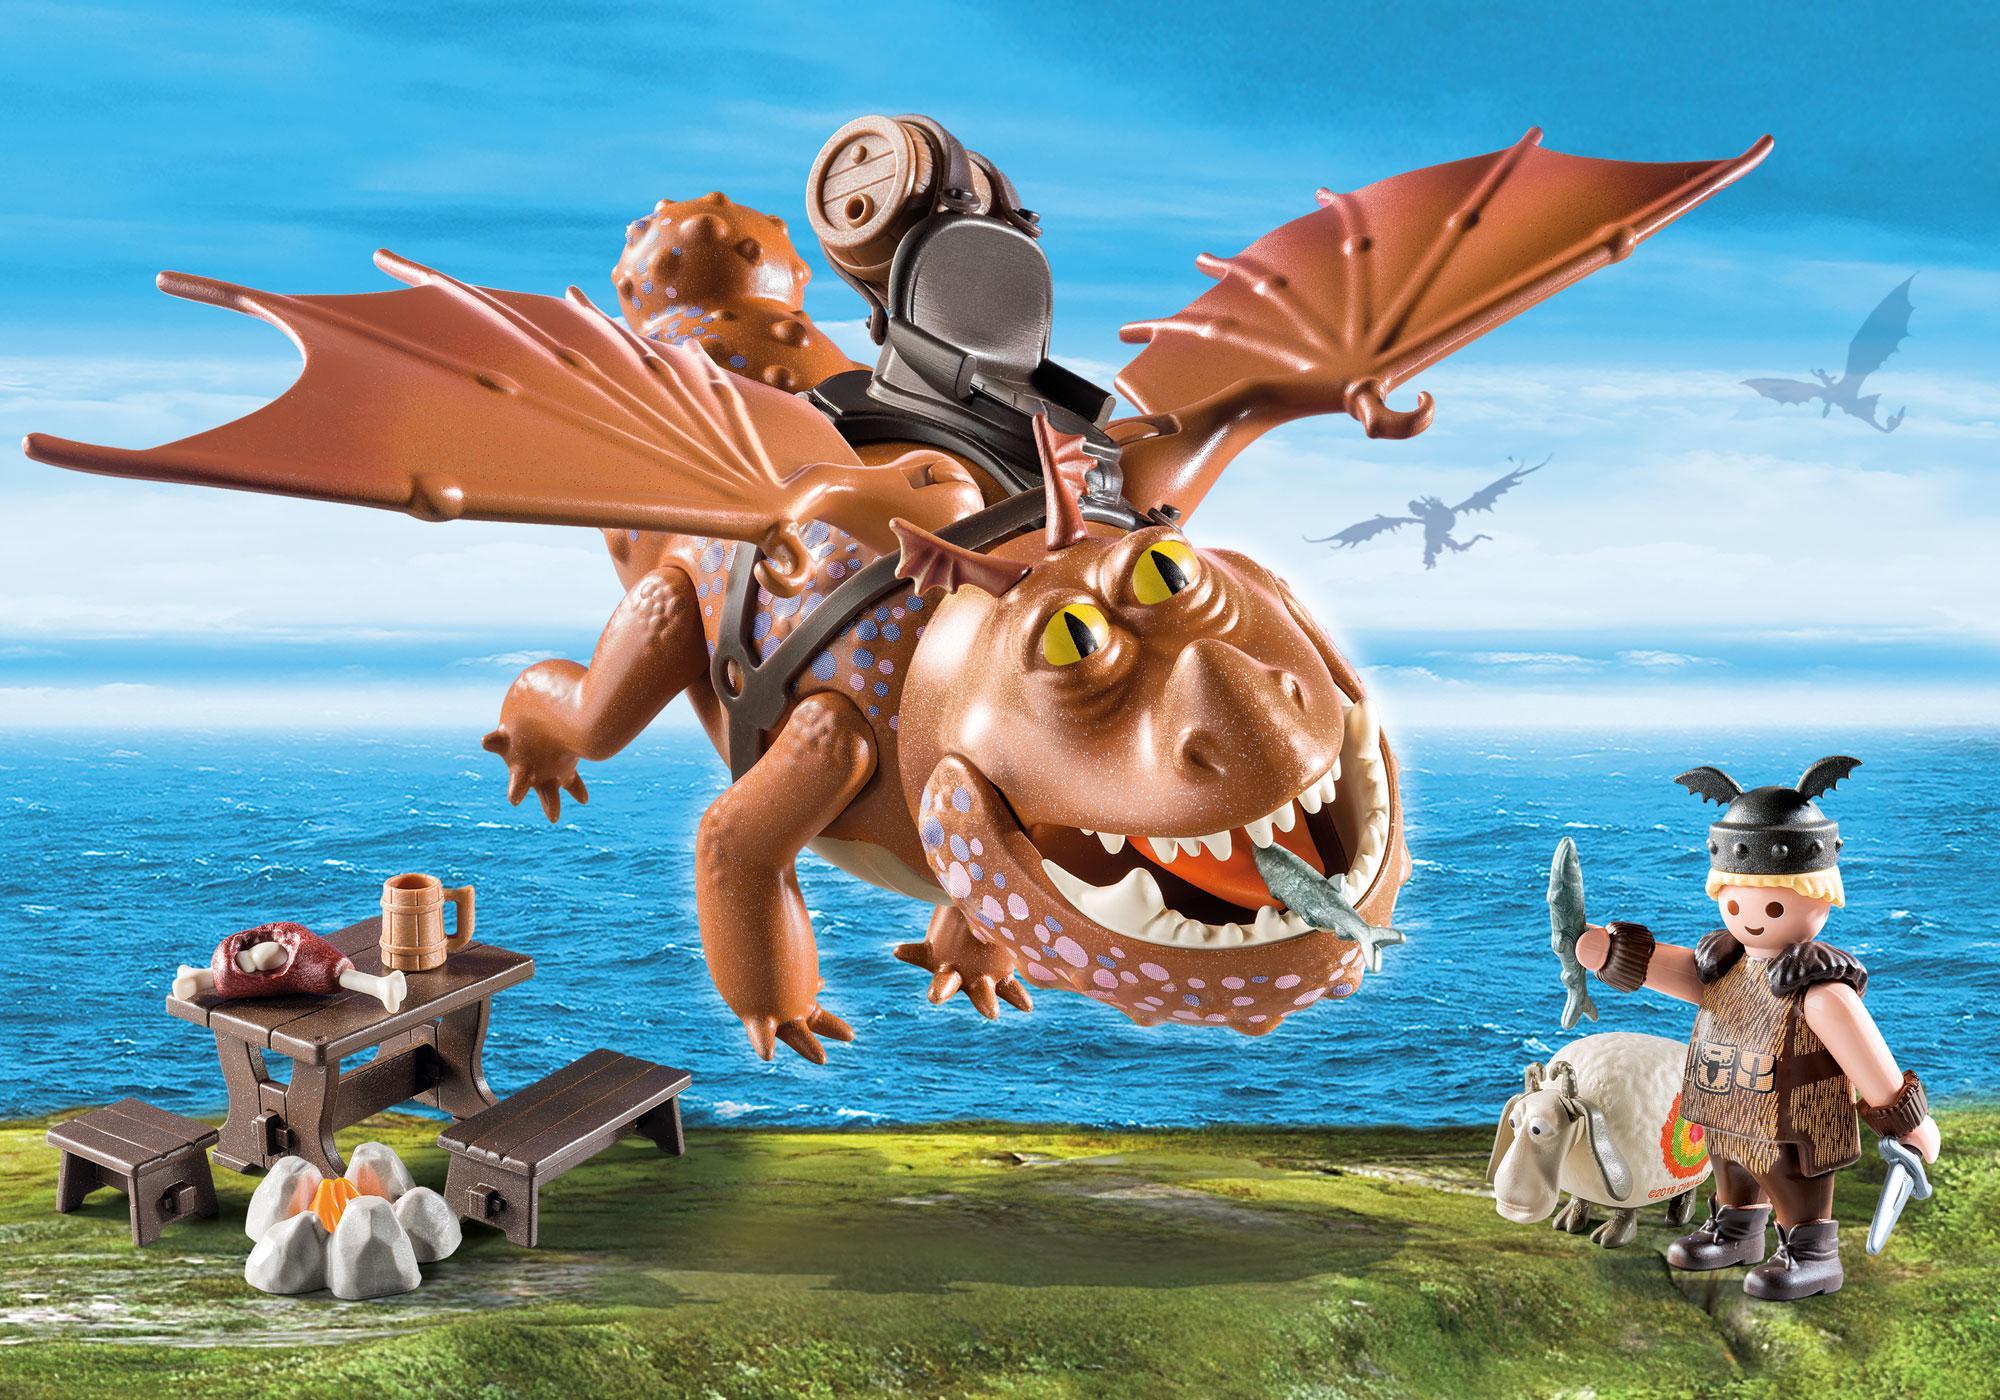 http://media.playmobil.com/i/playmobil/9460_product_detail/Molenga e Perna de Peixe